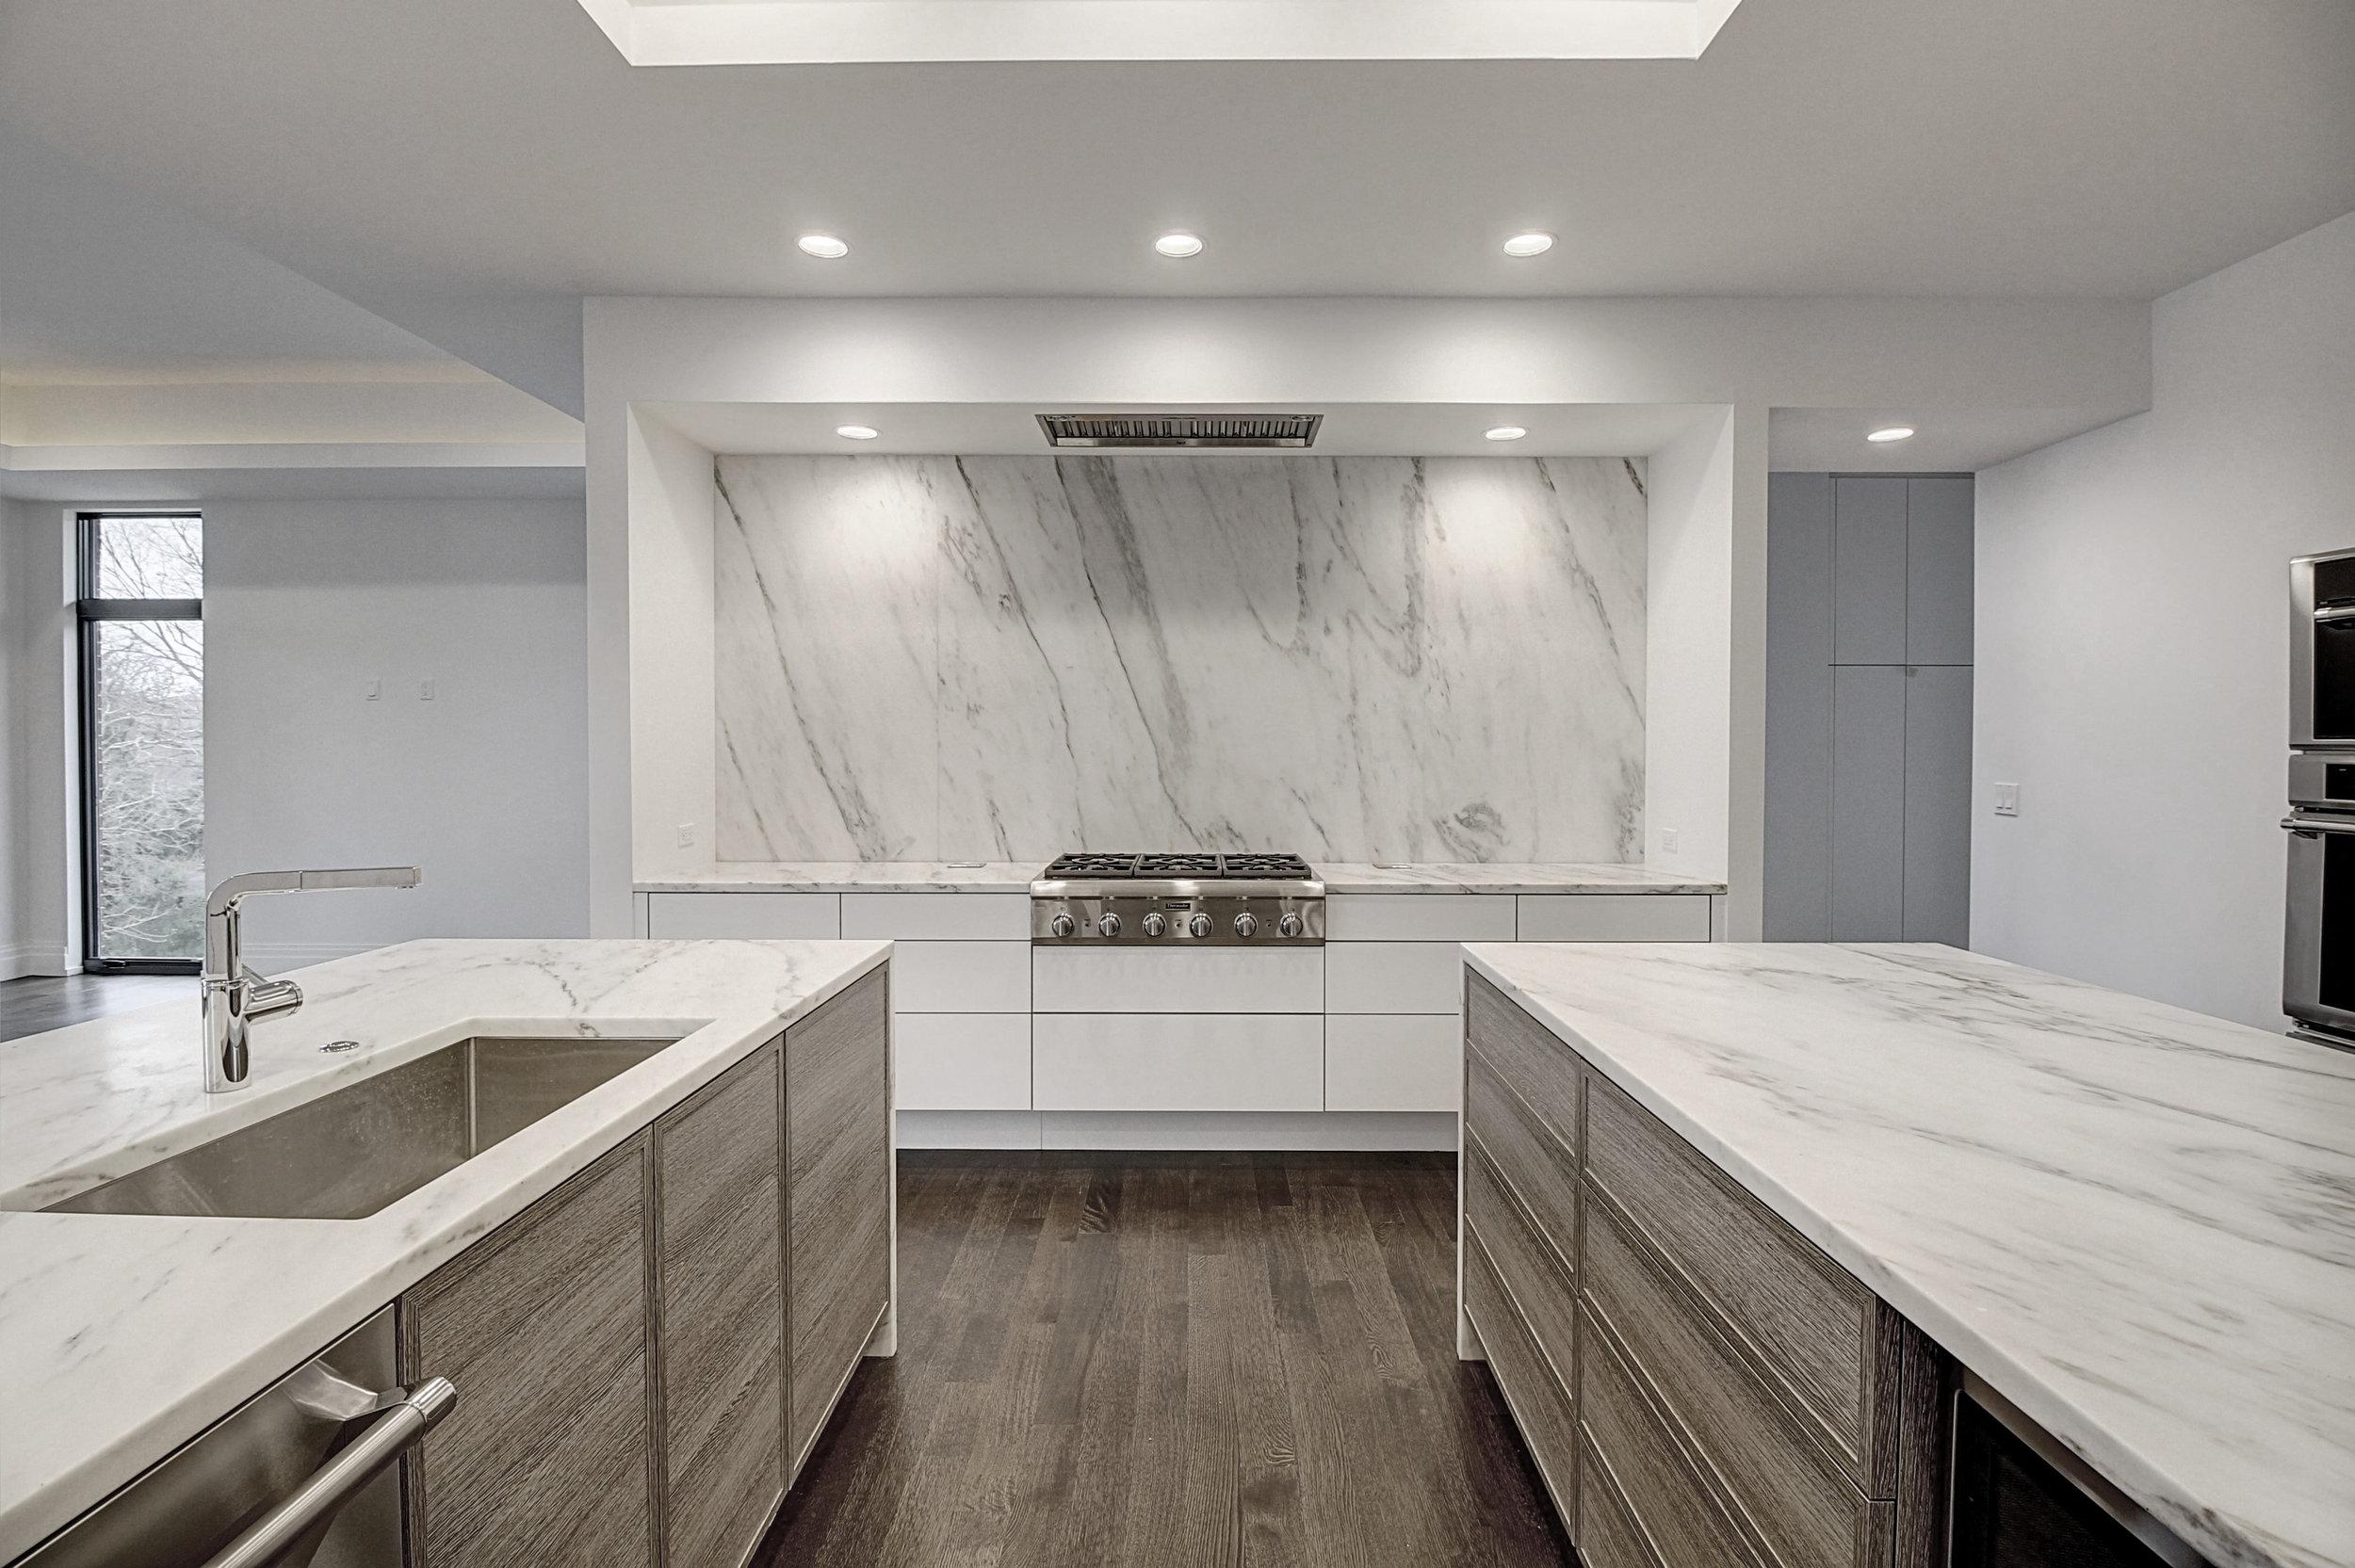 kitchengray2.jpg